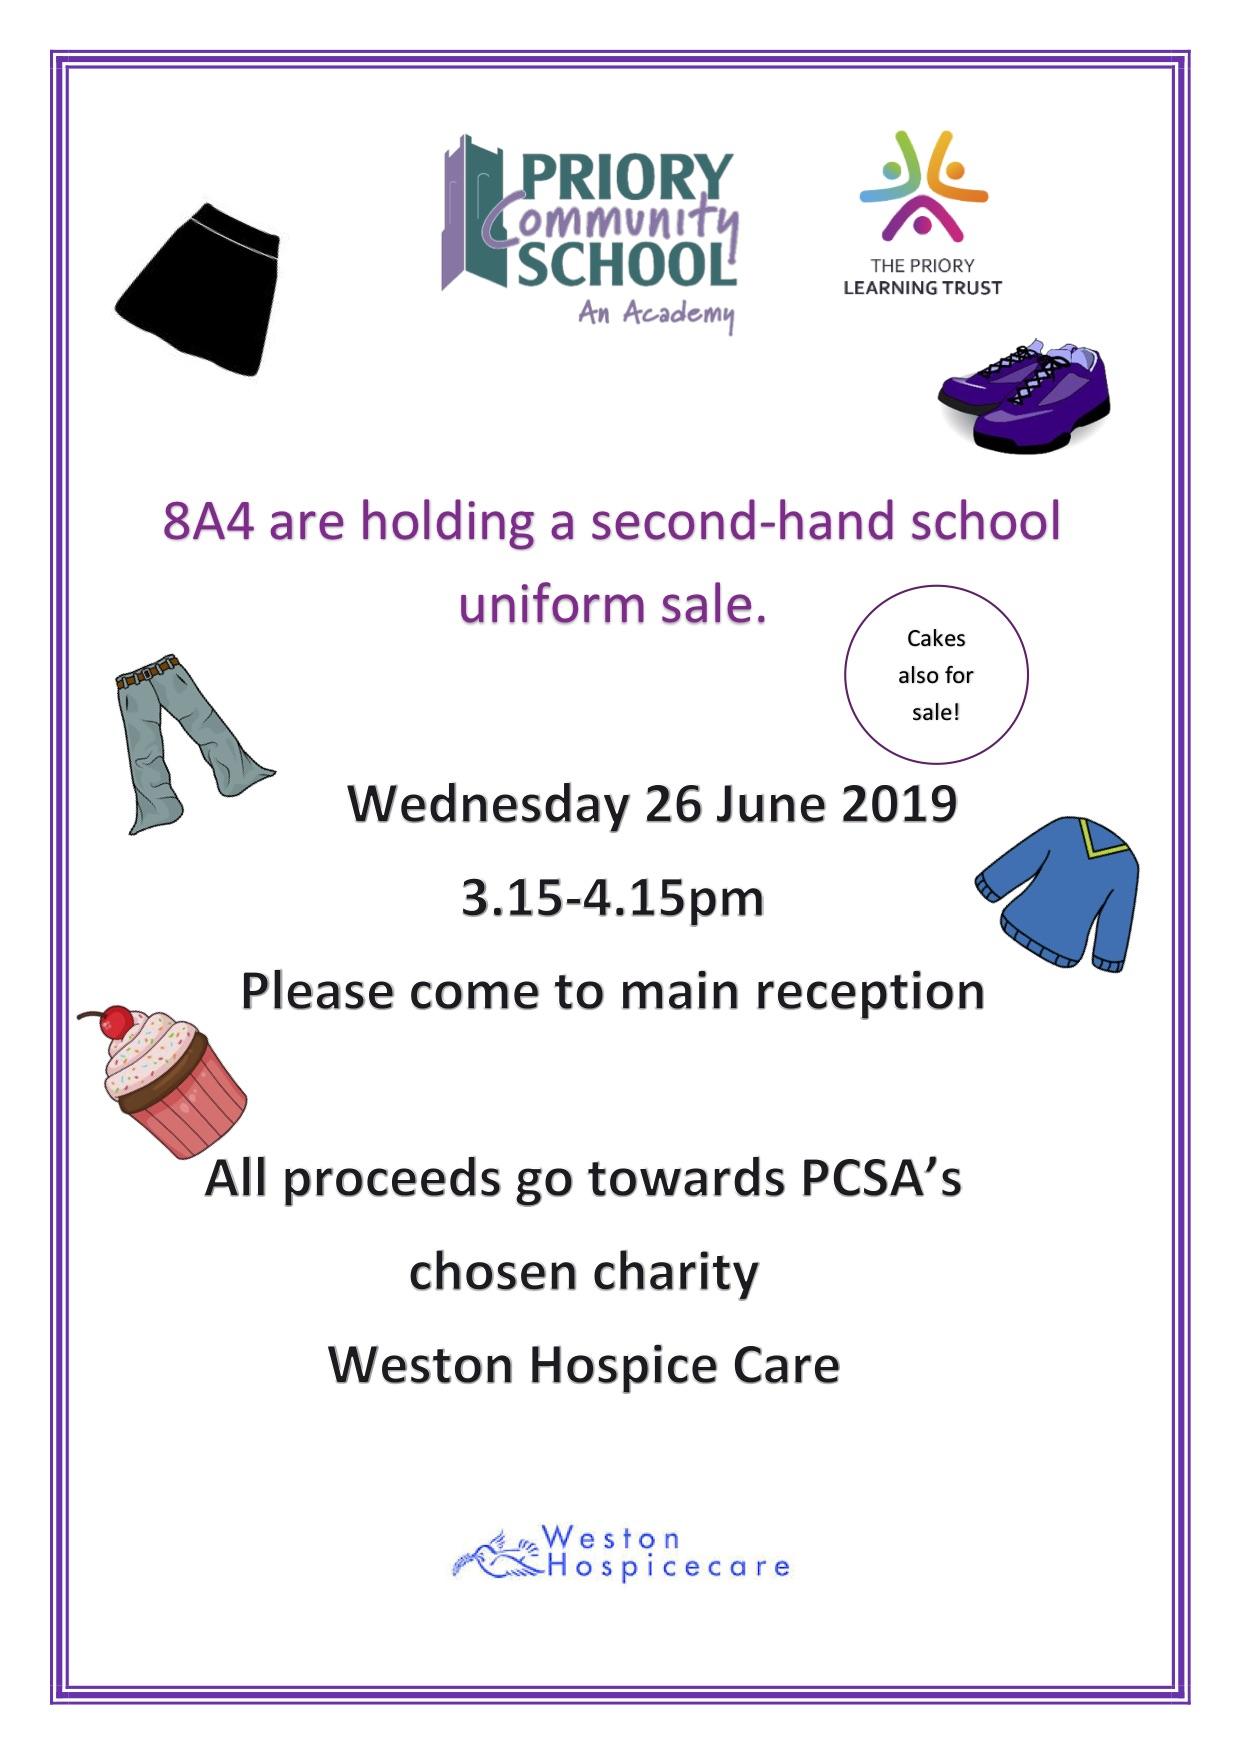 8A4 Priory Community School Uniform Sale 26.6.2019.jpg